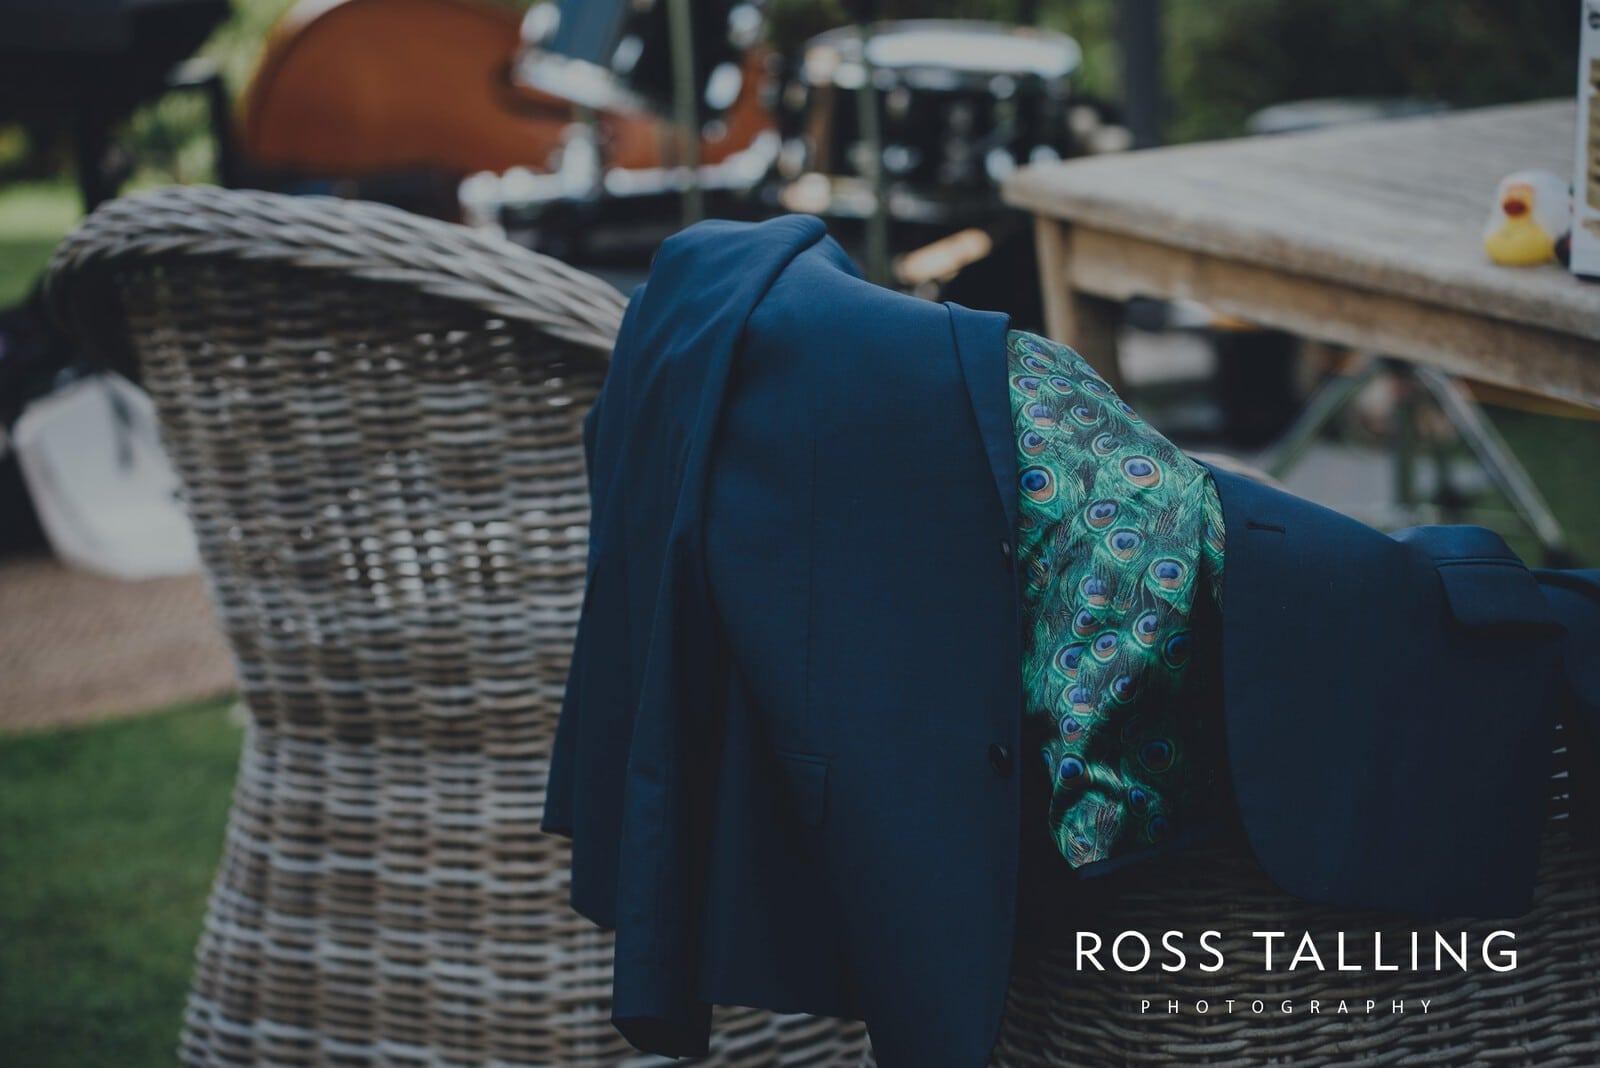 laura-matts-rosevine-hotel-wedding-photography-cornwall_0112